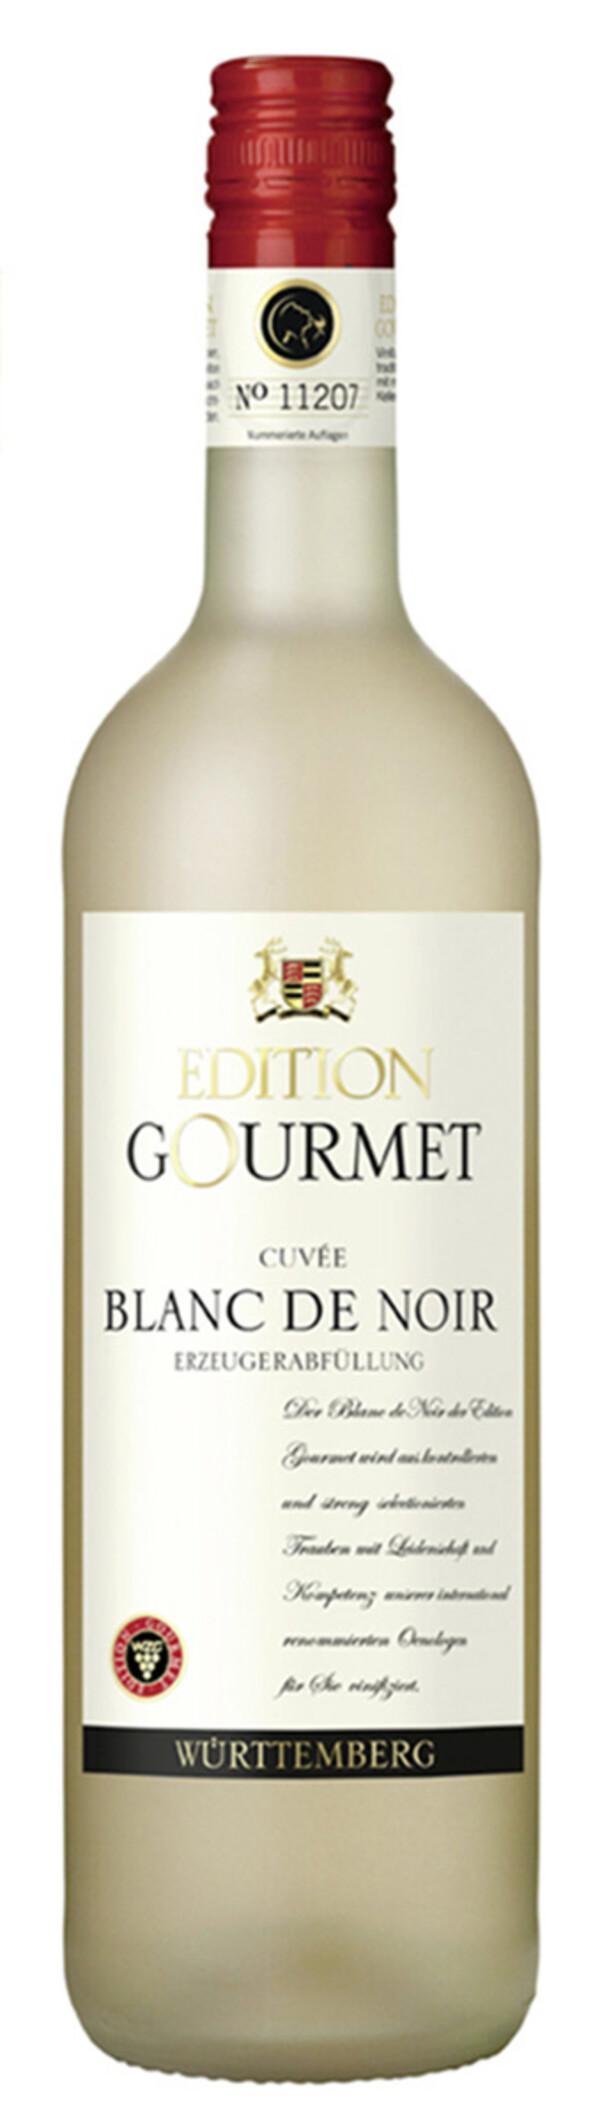 WZG Edition Gourmet Blanc de Noir 2018 0,75 ltr